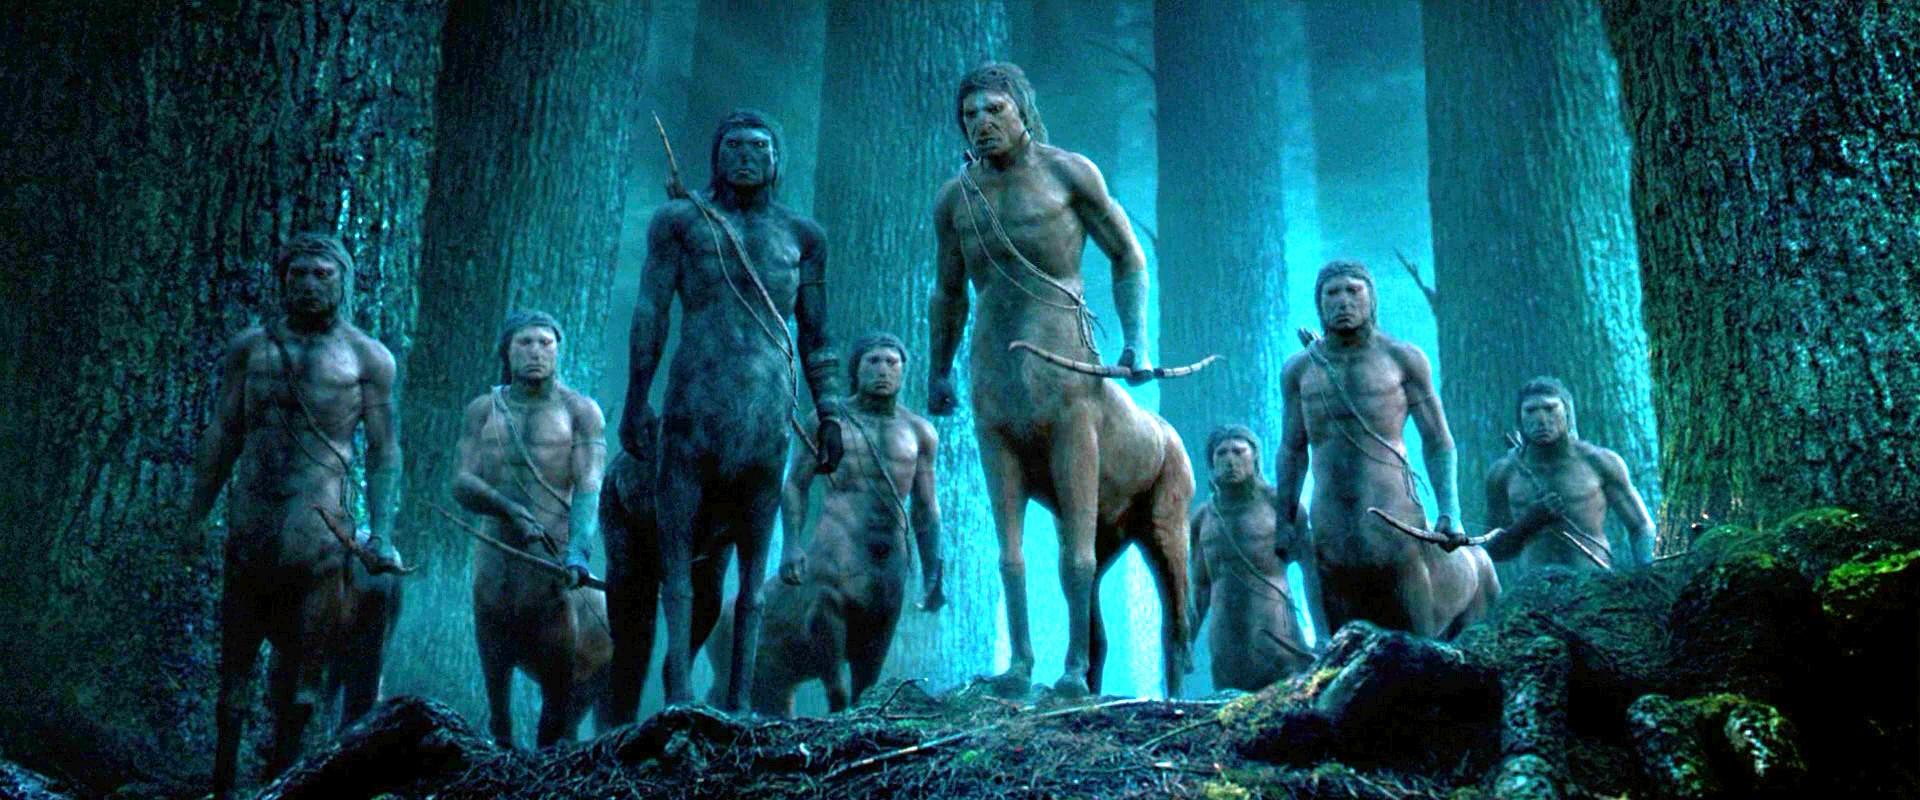 centaurs.jpg